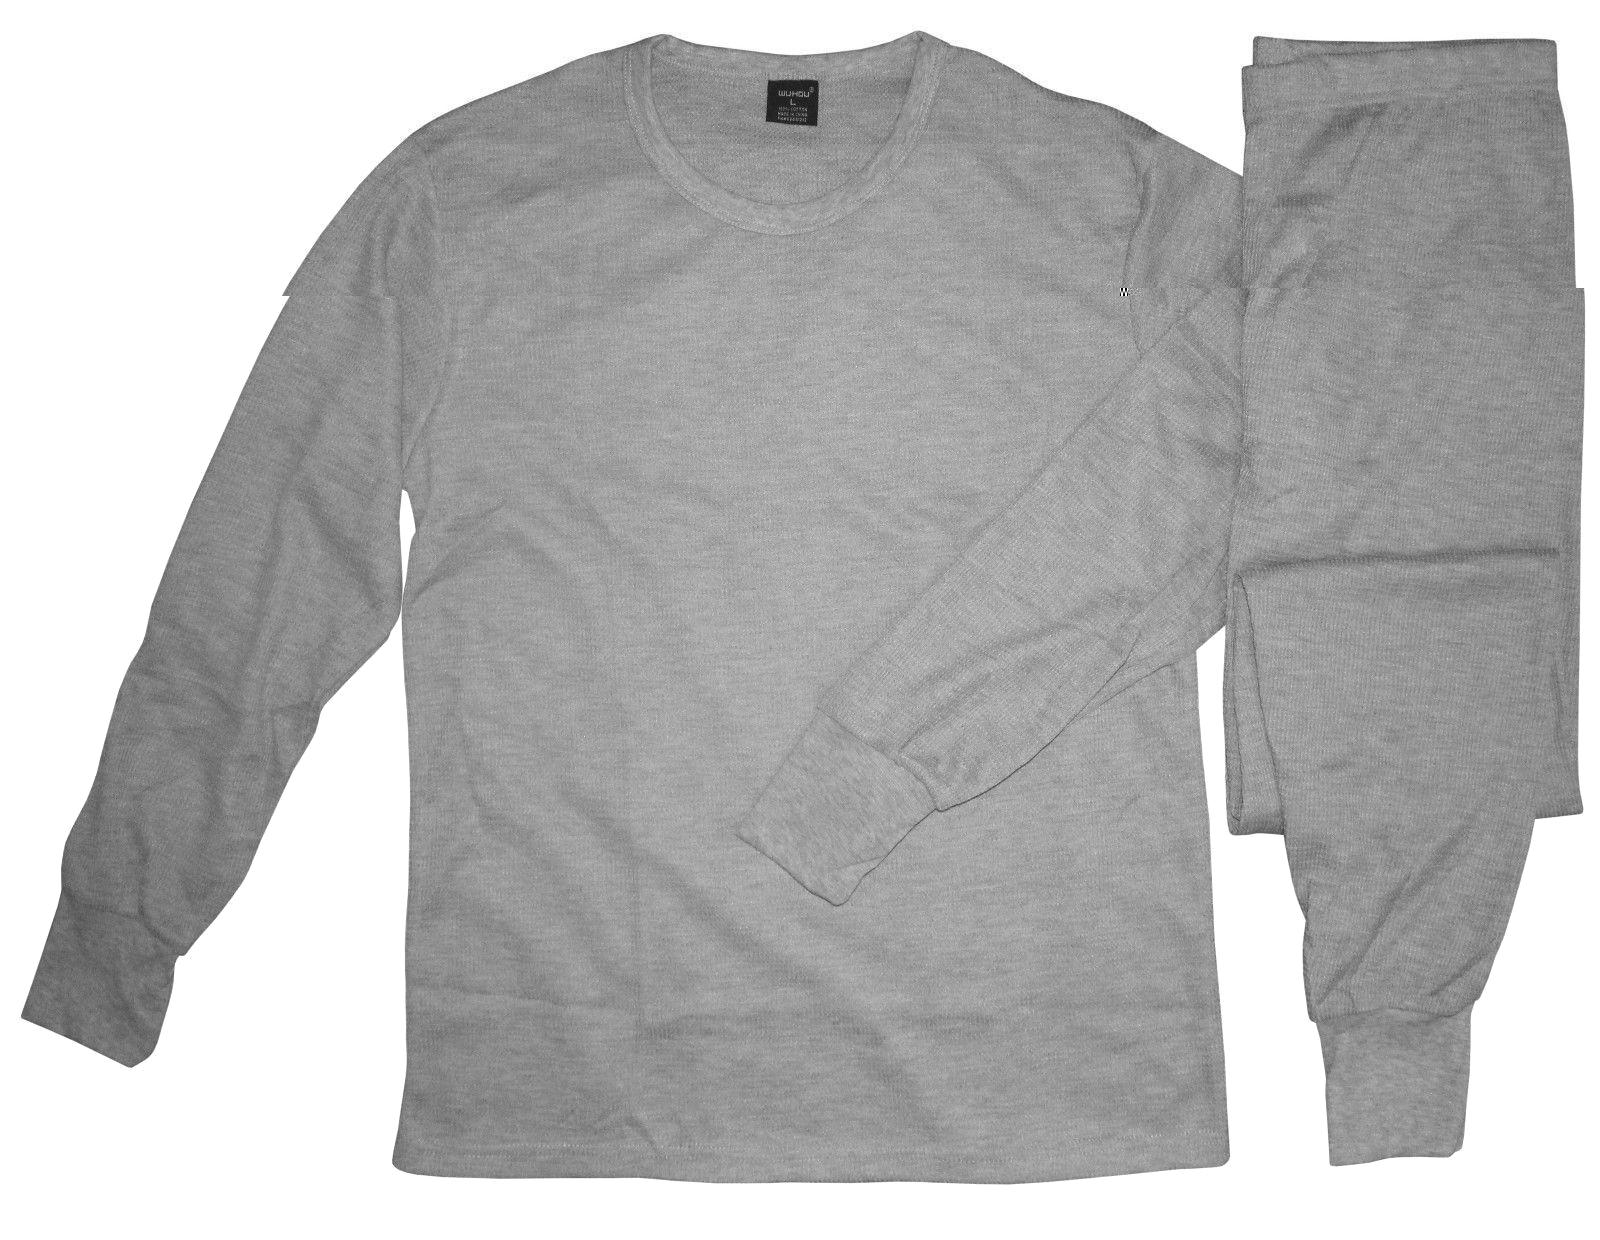 Comfort Fit Men S 100 Cotton Light Weight Waffle Knit